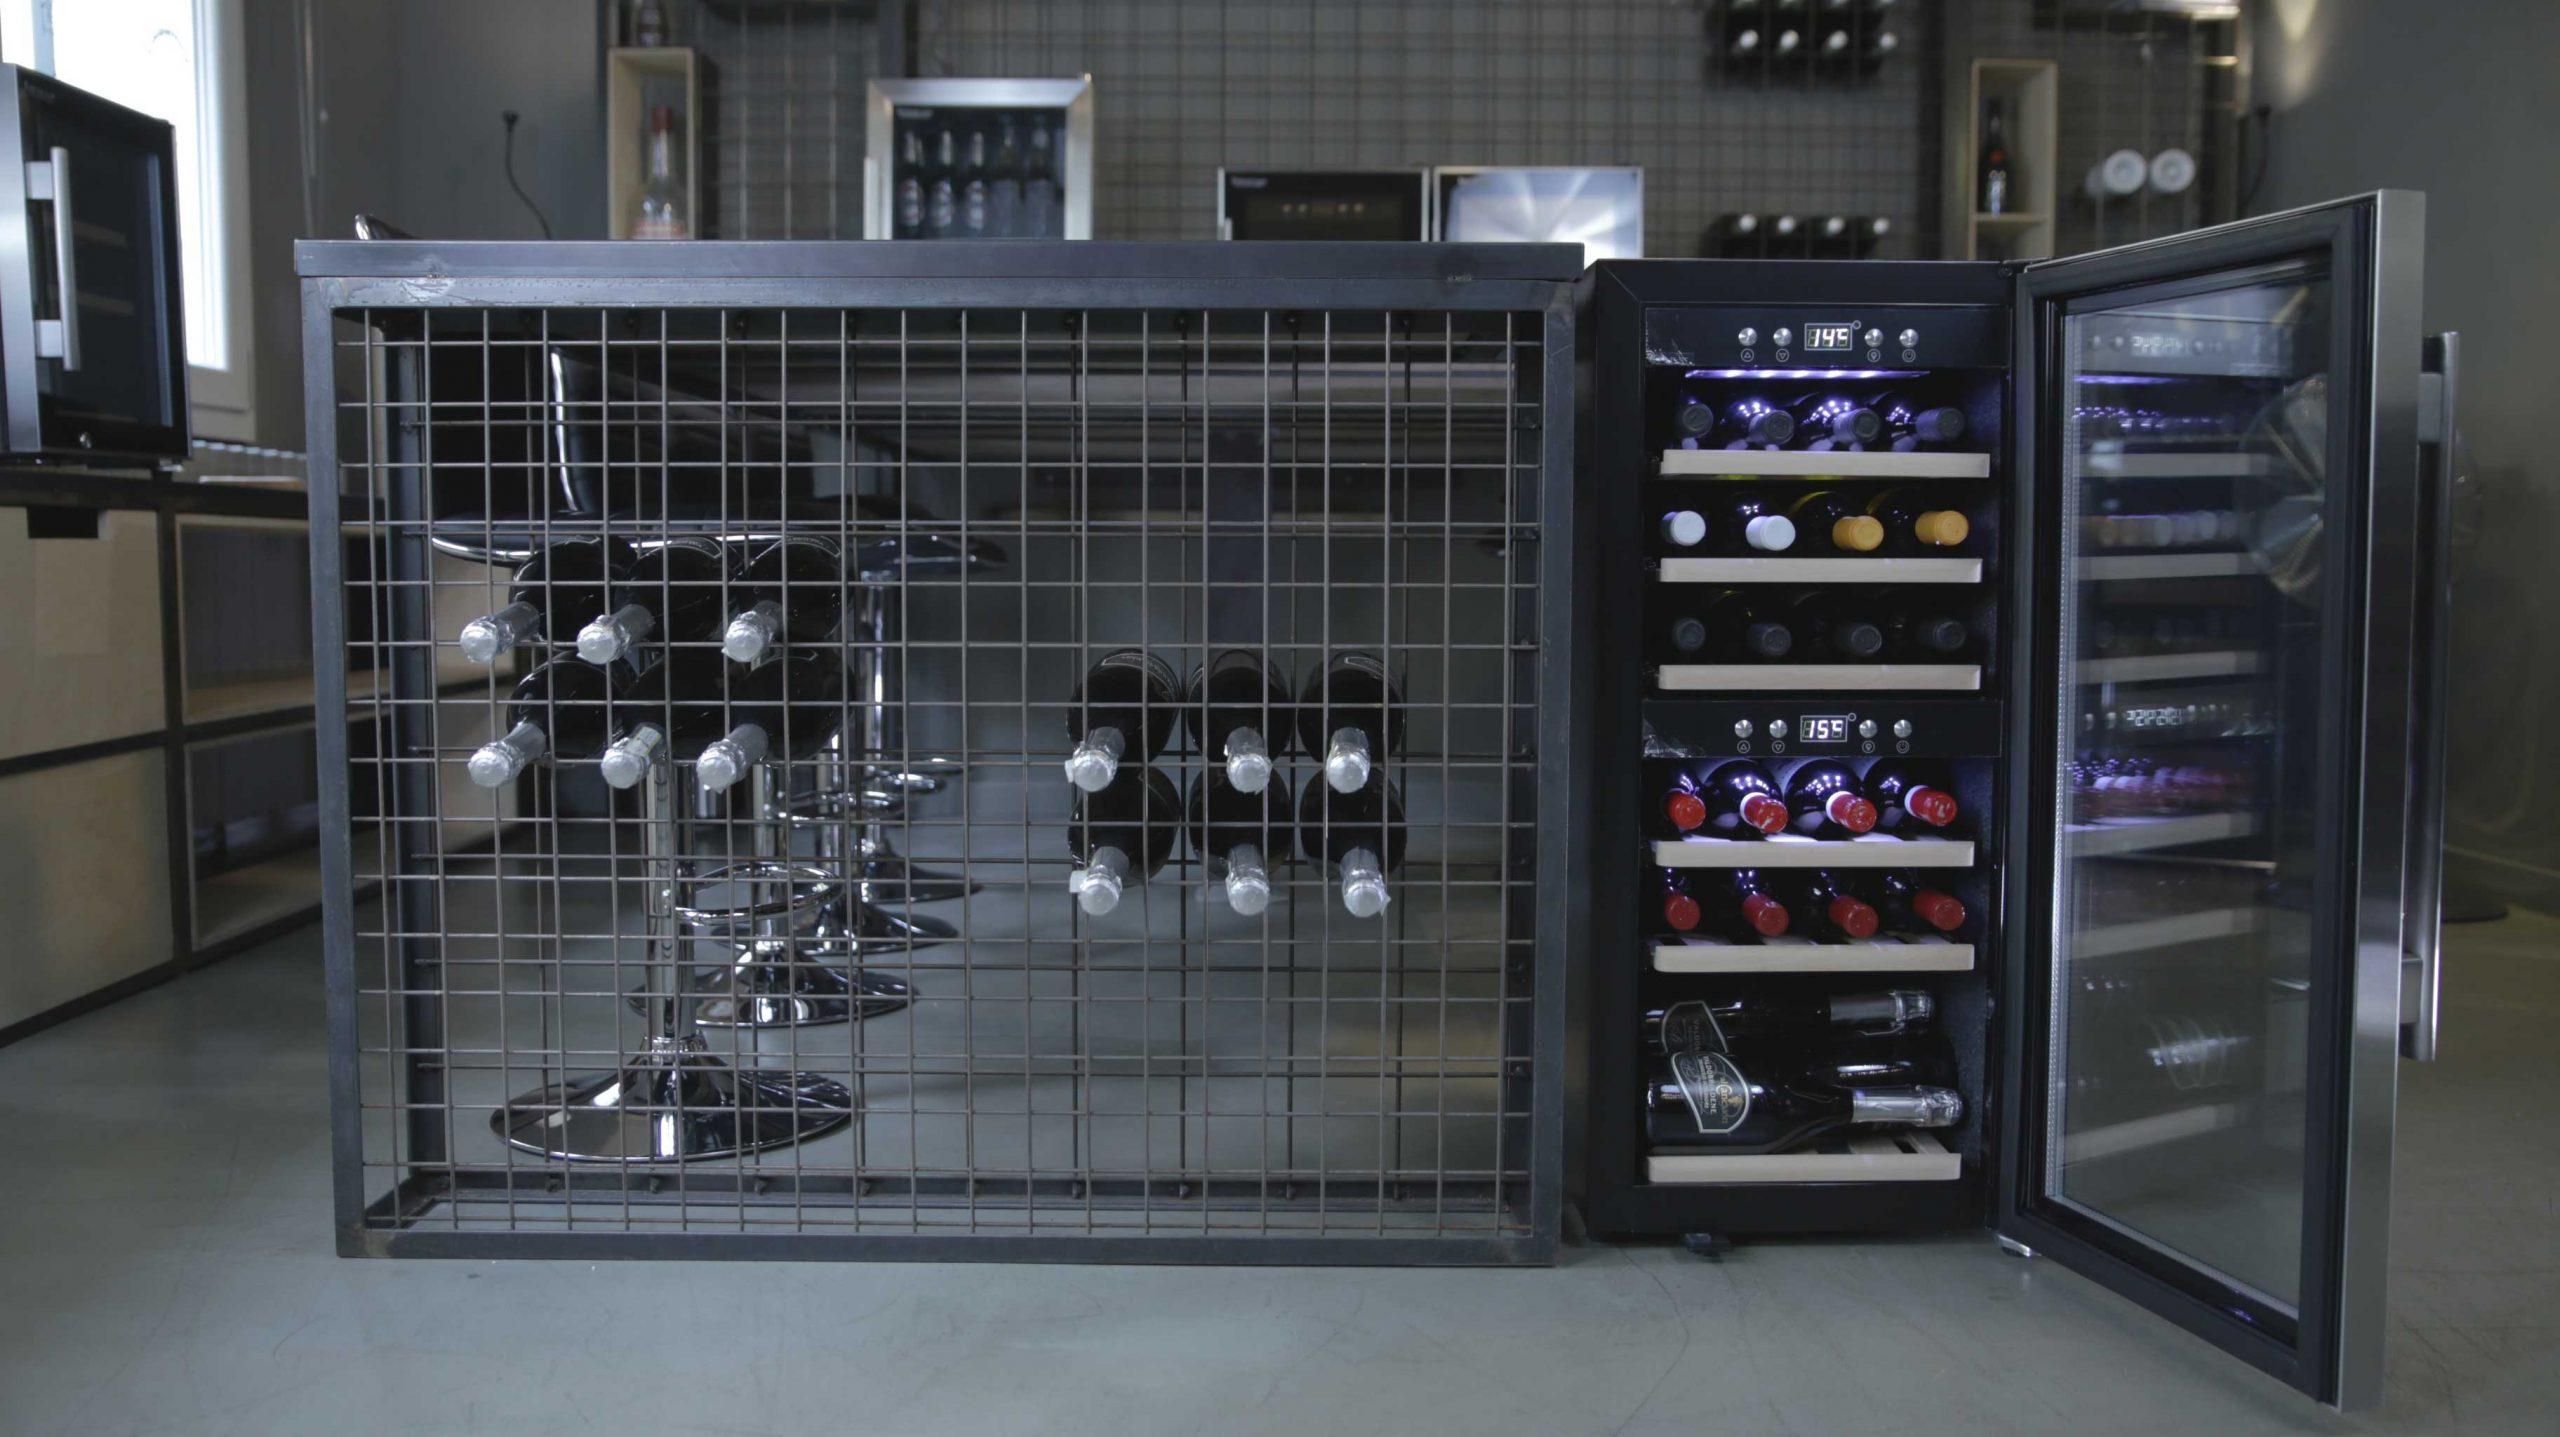 Cantinetta vino 24 bottiglie, compressore